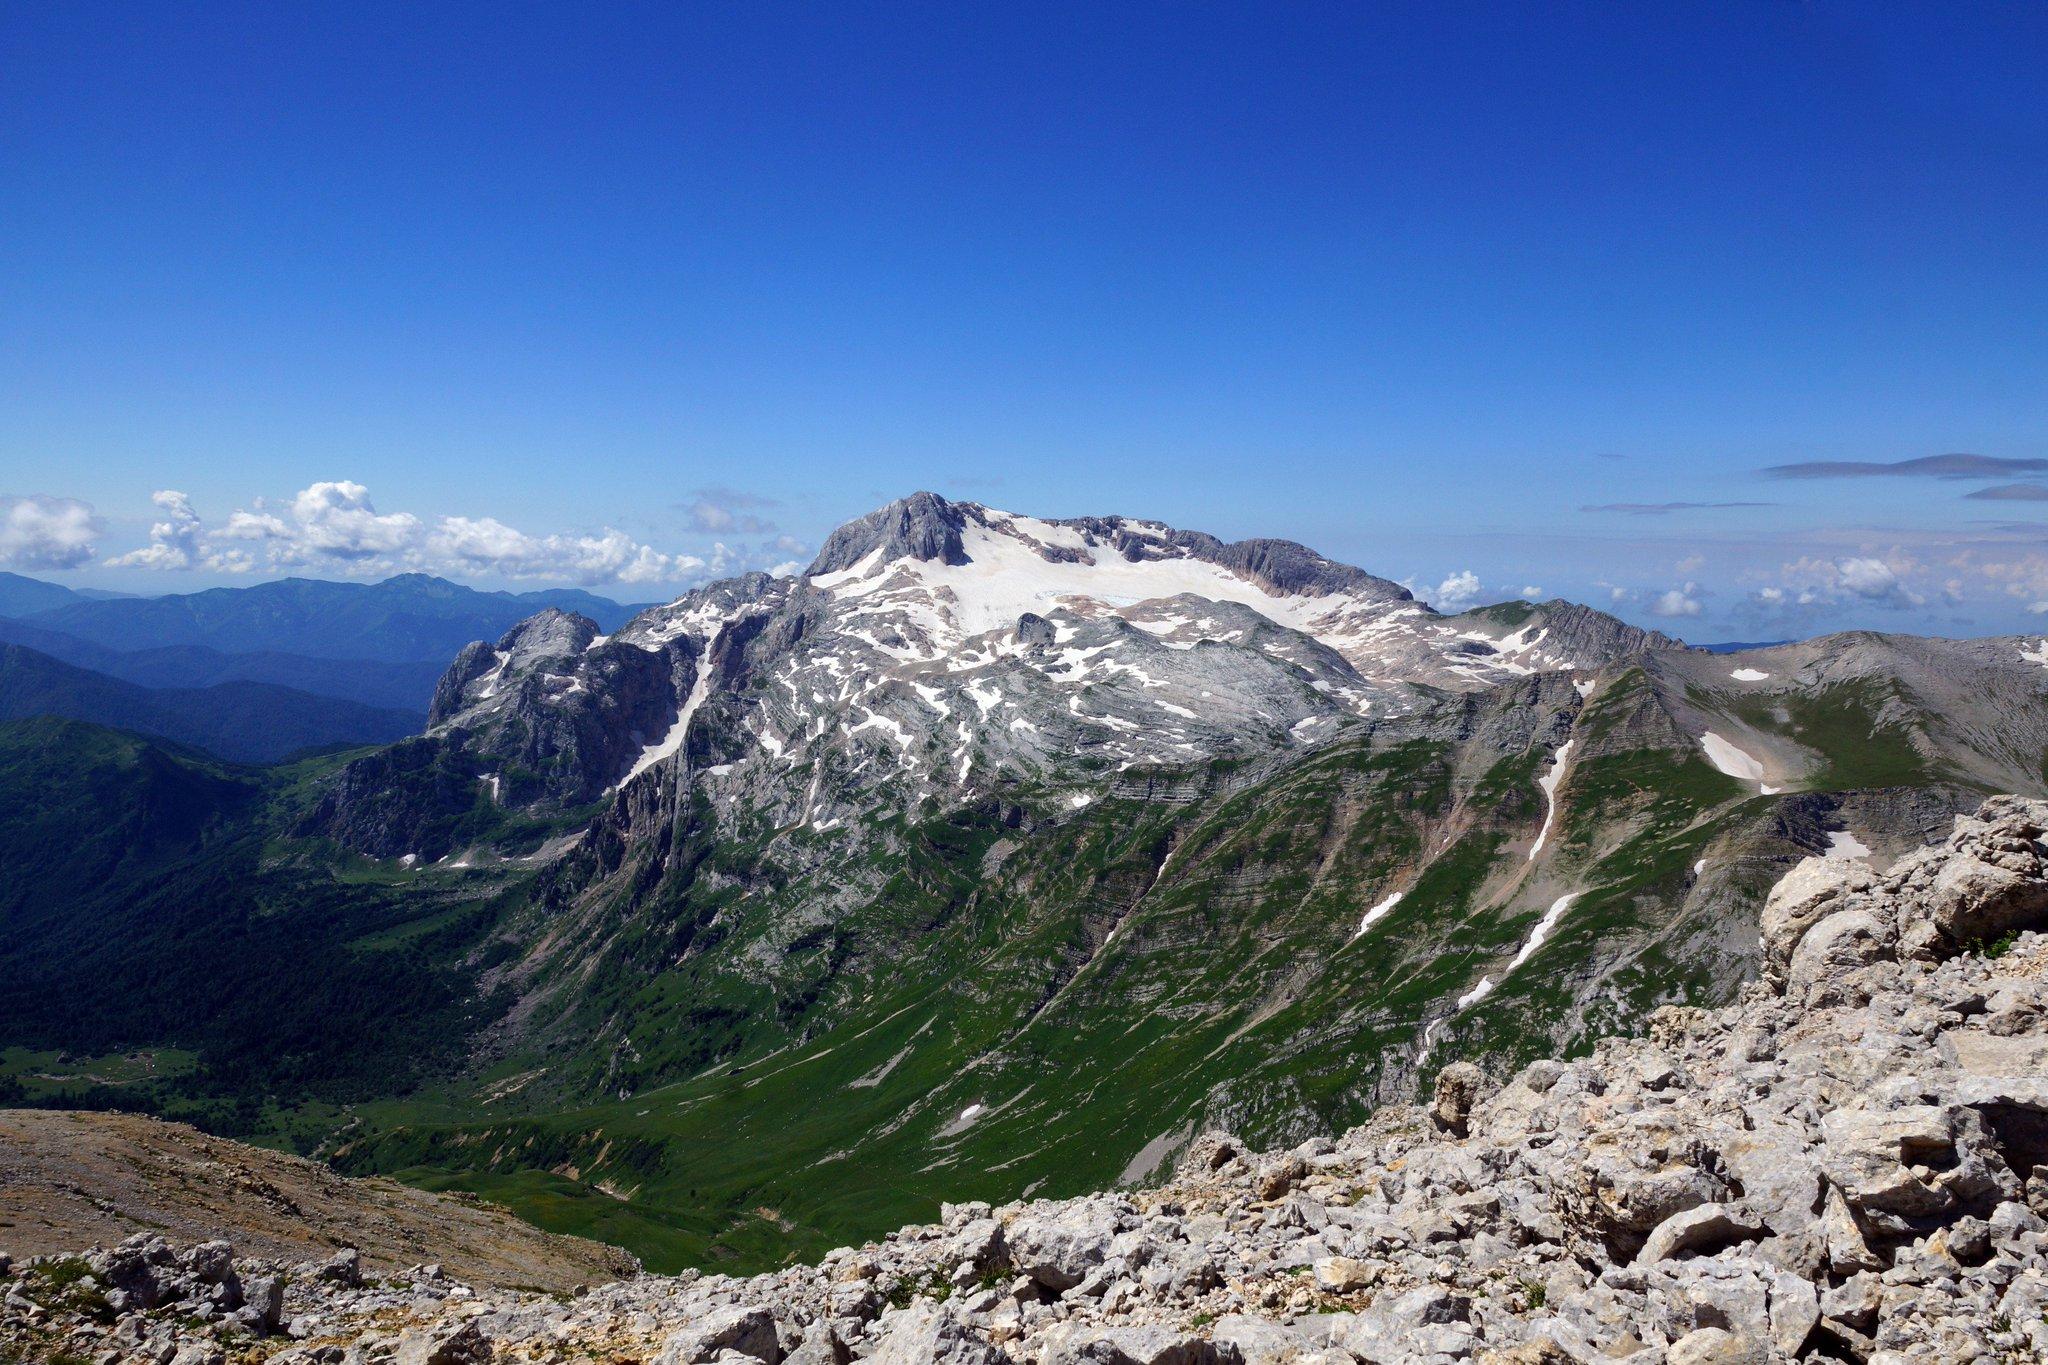 картинки майкоп вид на горы чем фанаты звезды